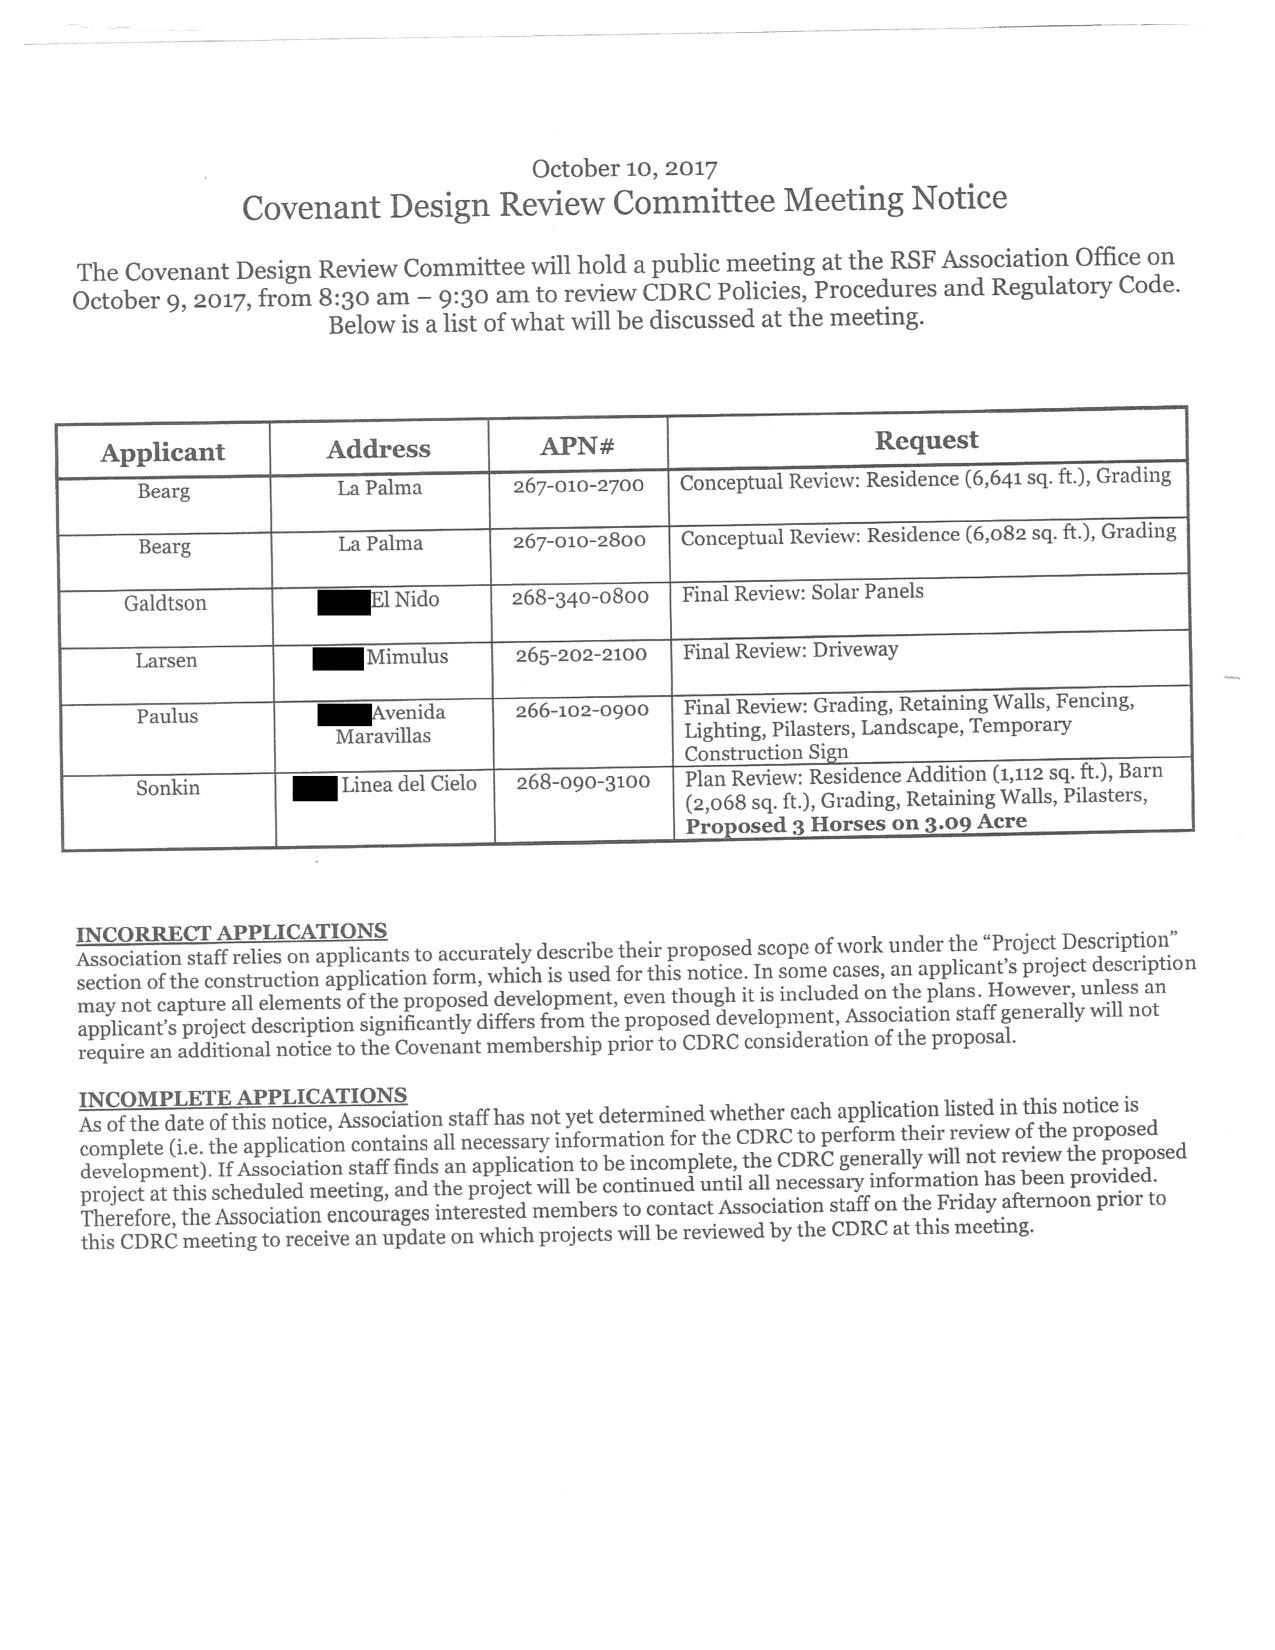 CDRC_notice_oct_2017_page1.jpg